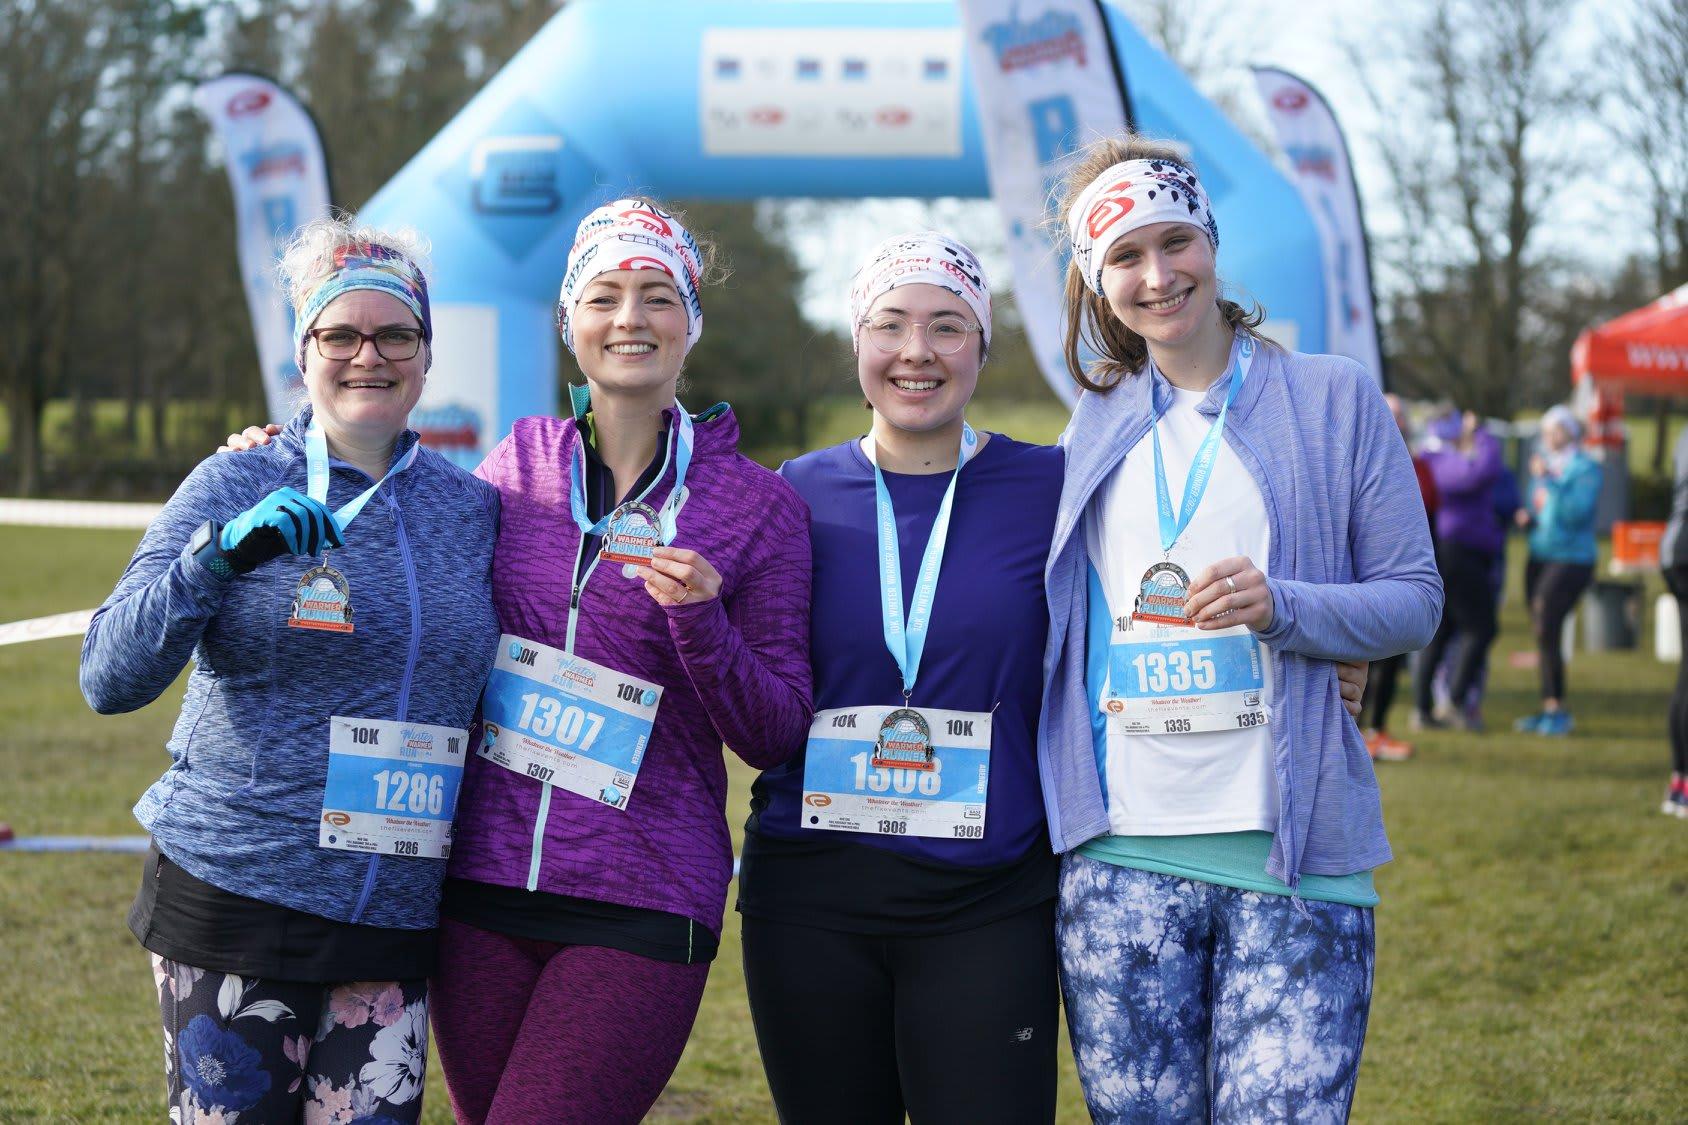 The Manchester 5k and 10k Winter Warmer Run